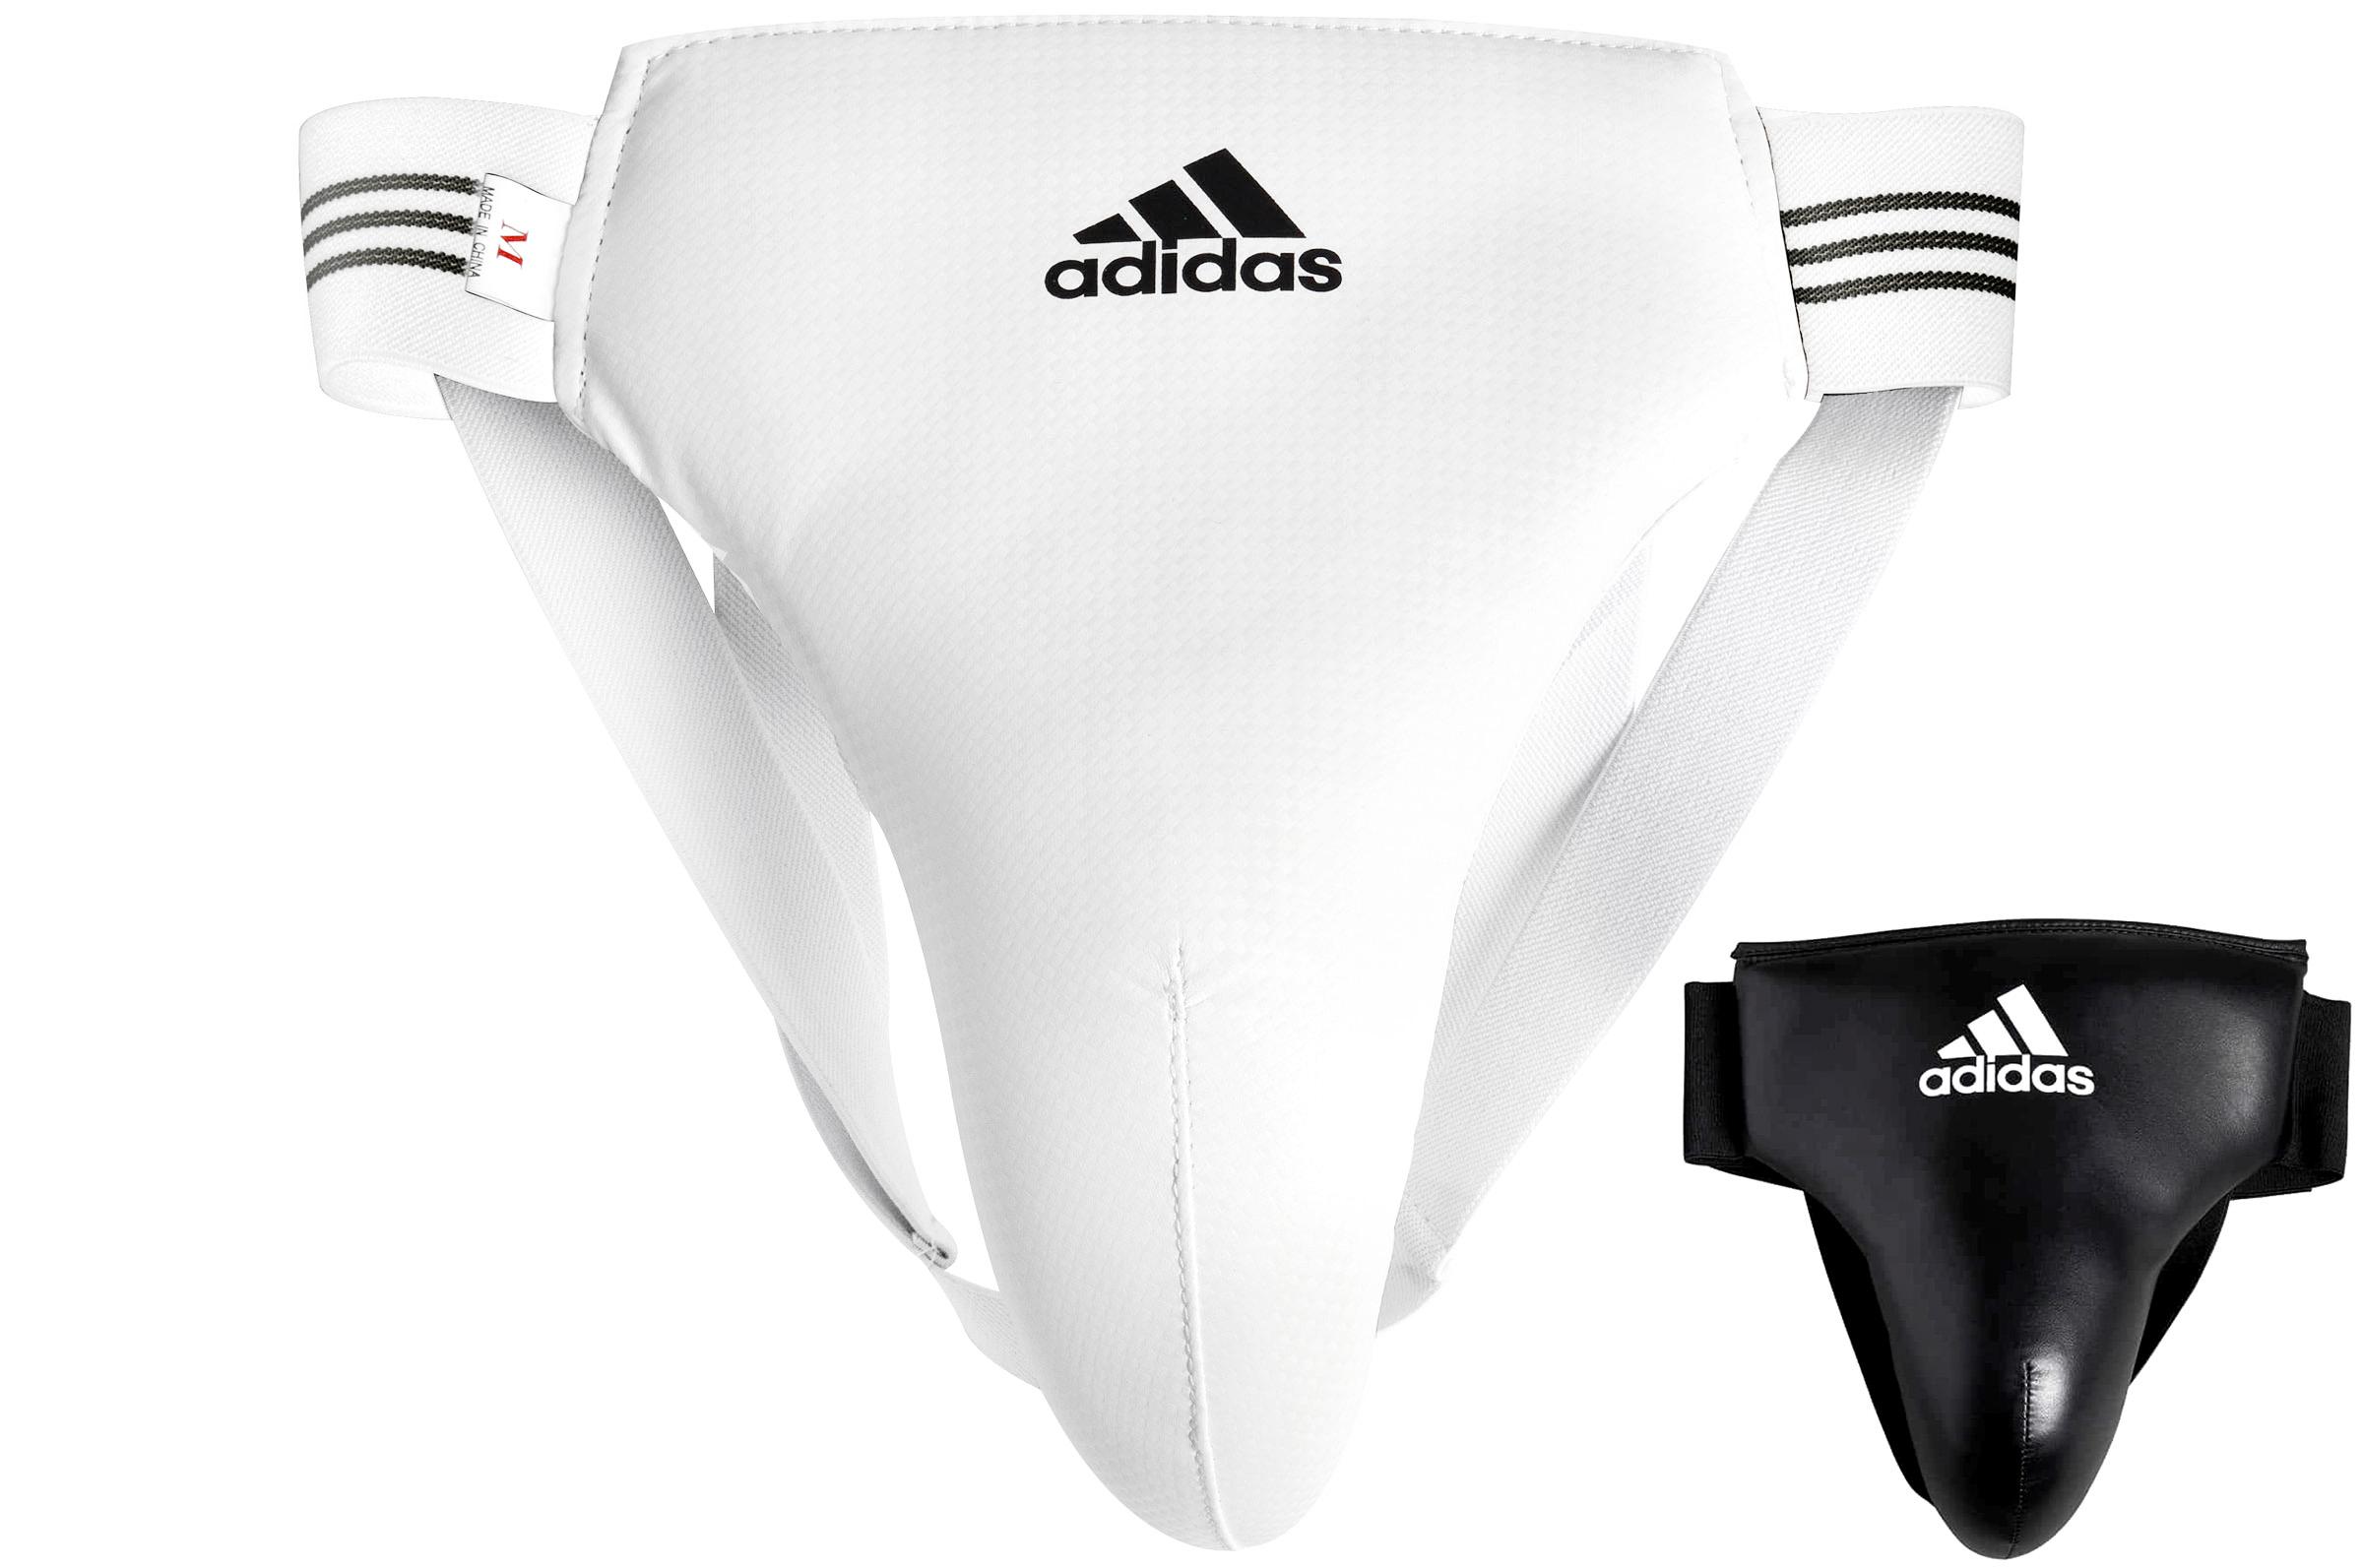 Concha anatómica hombre, Adidas ADIBP05 - DragonSports.eu